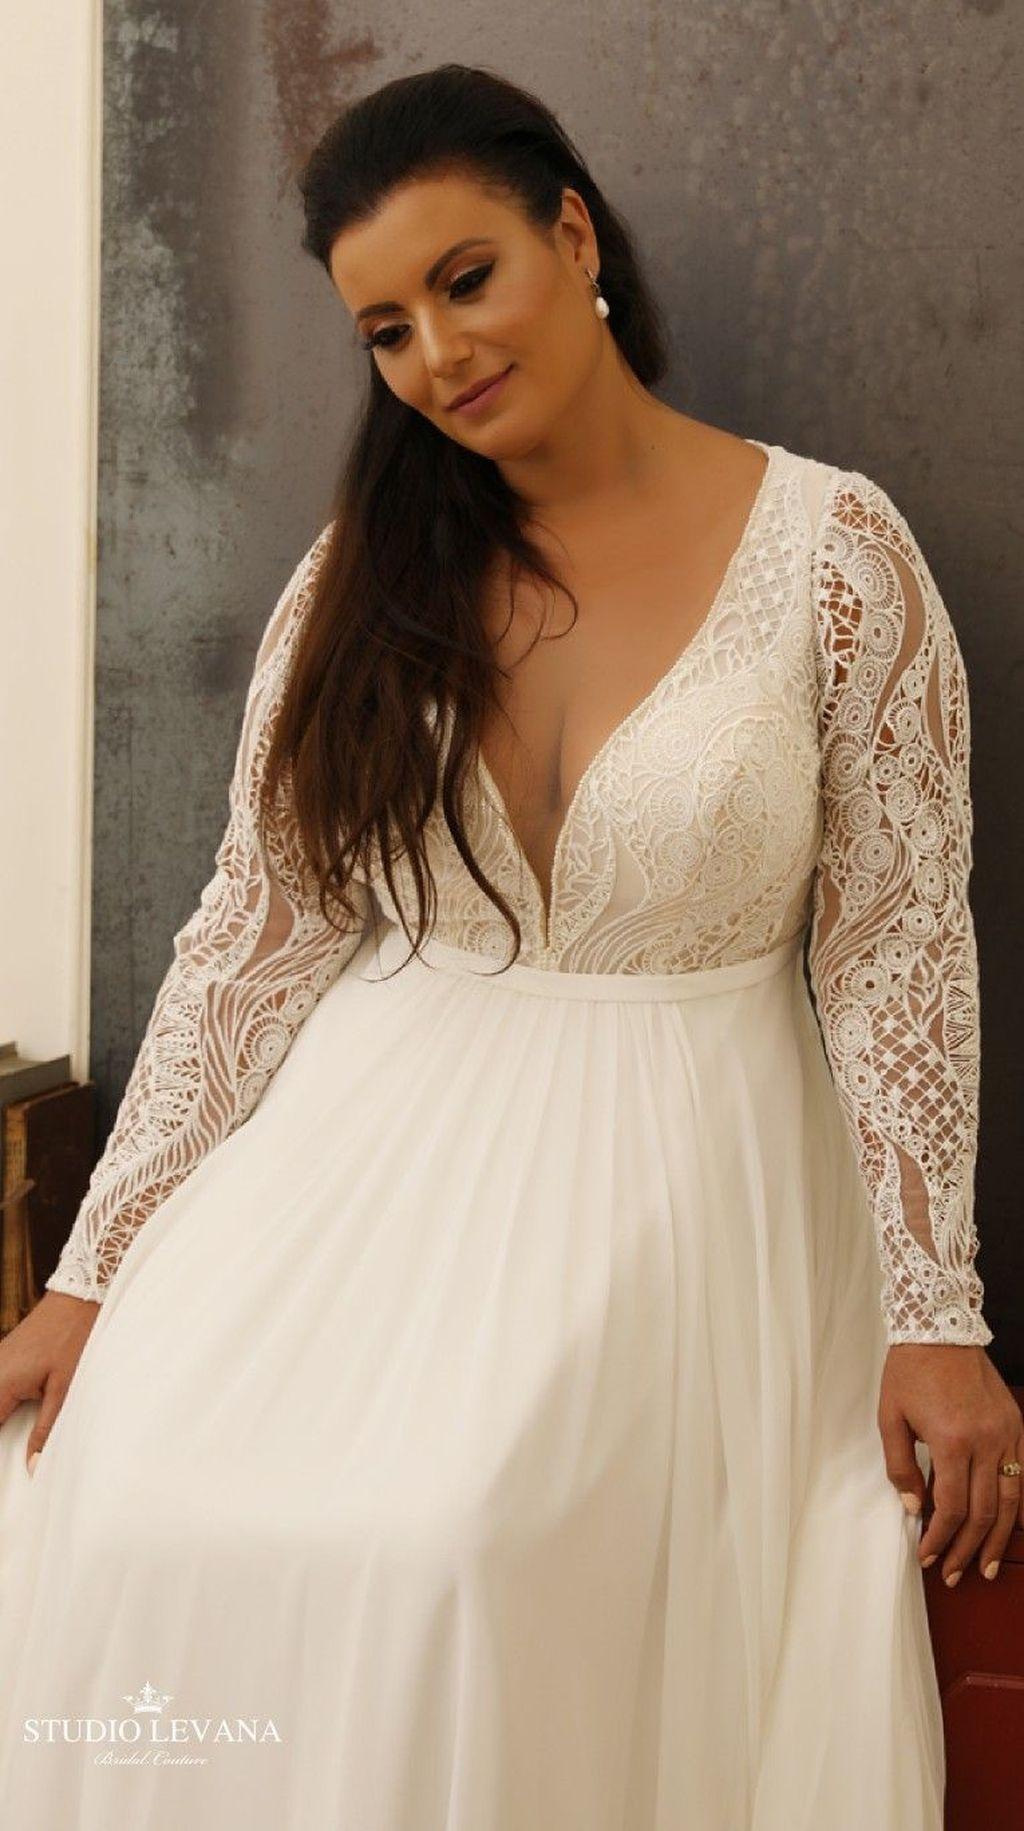 20 Cute Bohemian Style Wedding Dress Ideas For Outdoor Wedding Plus Wedding Dresses Bohemian Style Wedding Dresses Plus Size Wedding Gowns [ 1831 x 1024 Pixel ]